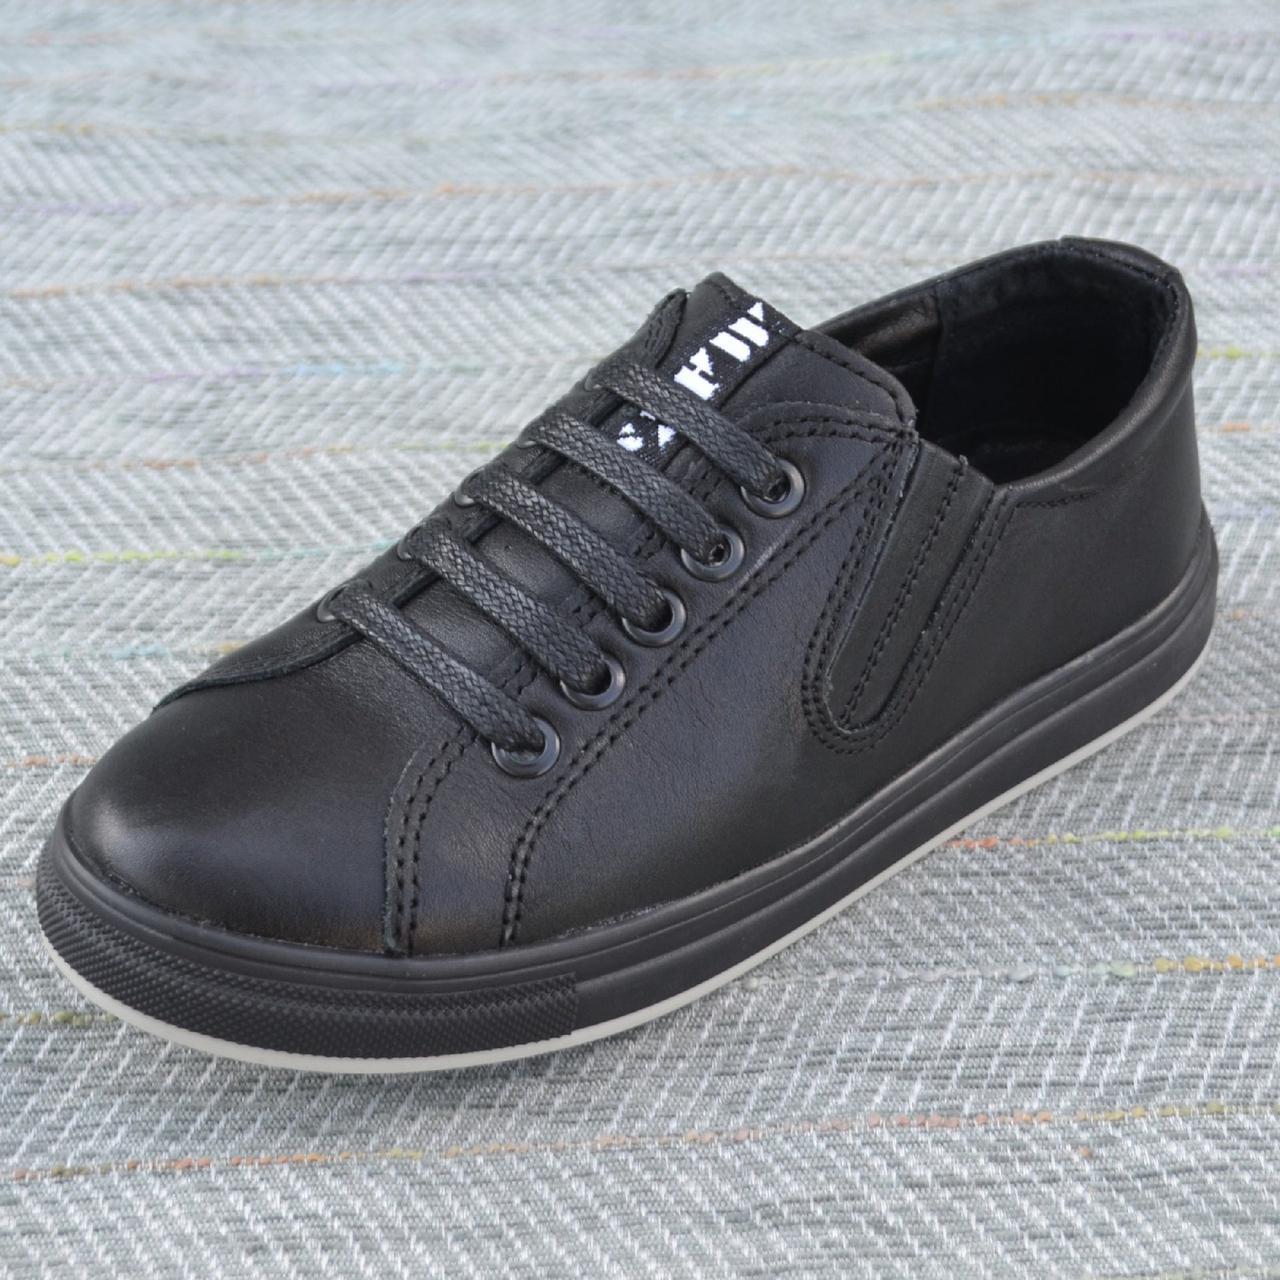 de52f77bd Туфли на резинках, Maxus размер 34 - Интернет-магазин Налетайка в Обухове